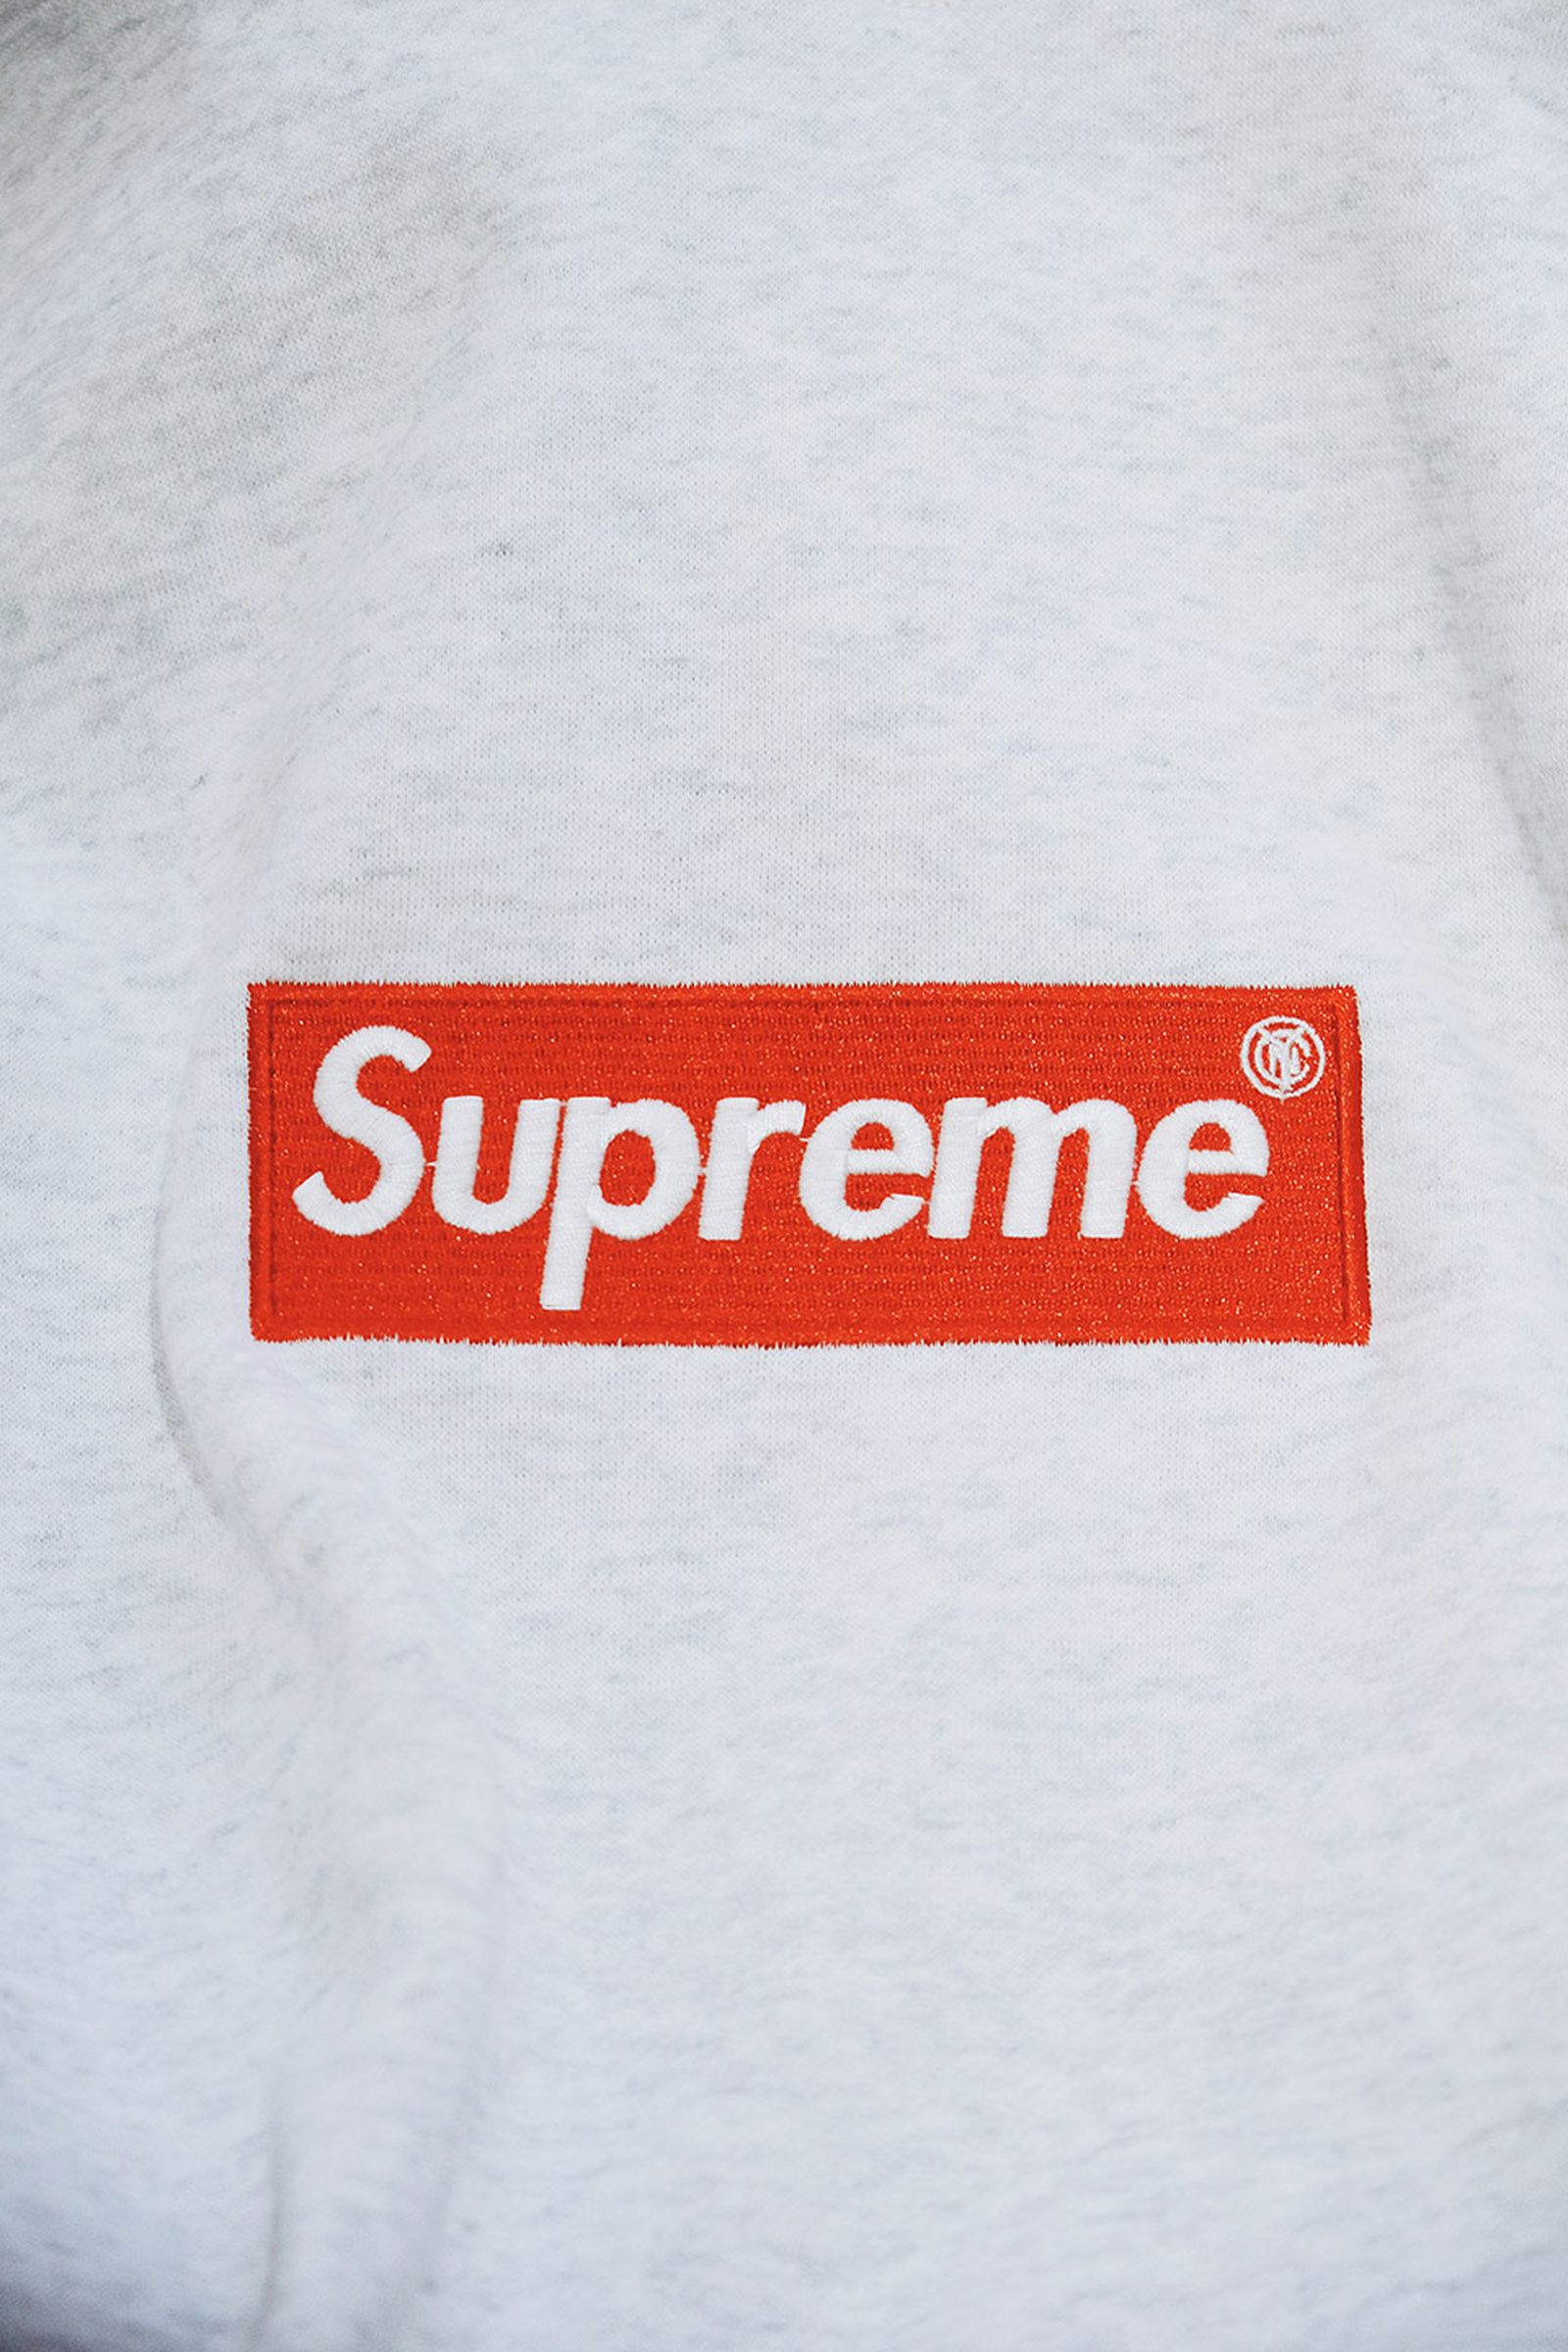 supreme store fake china counterfeit